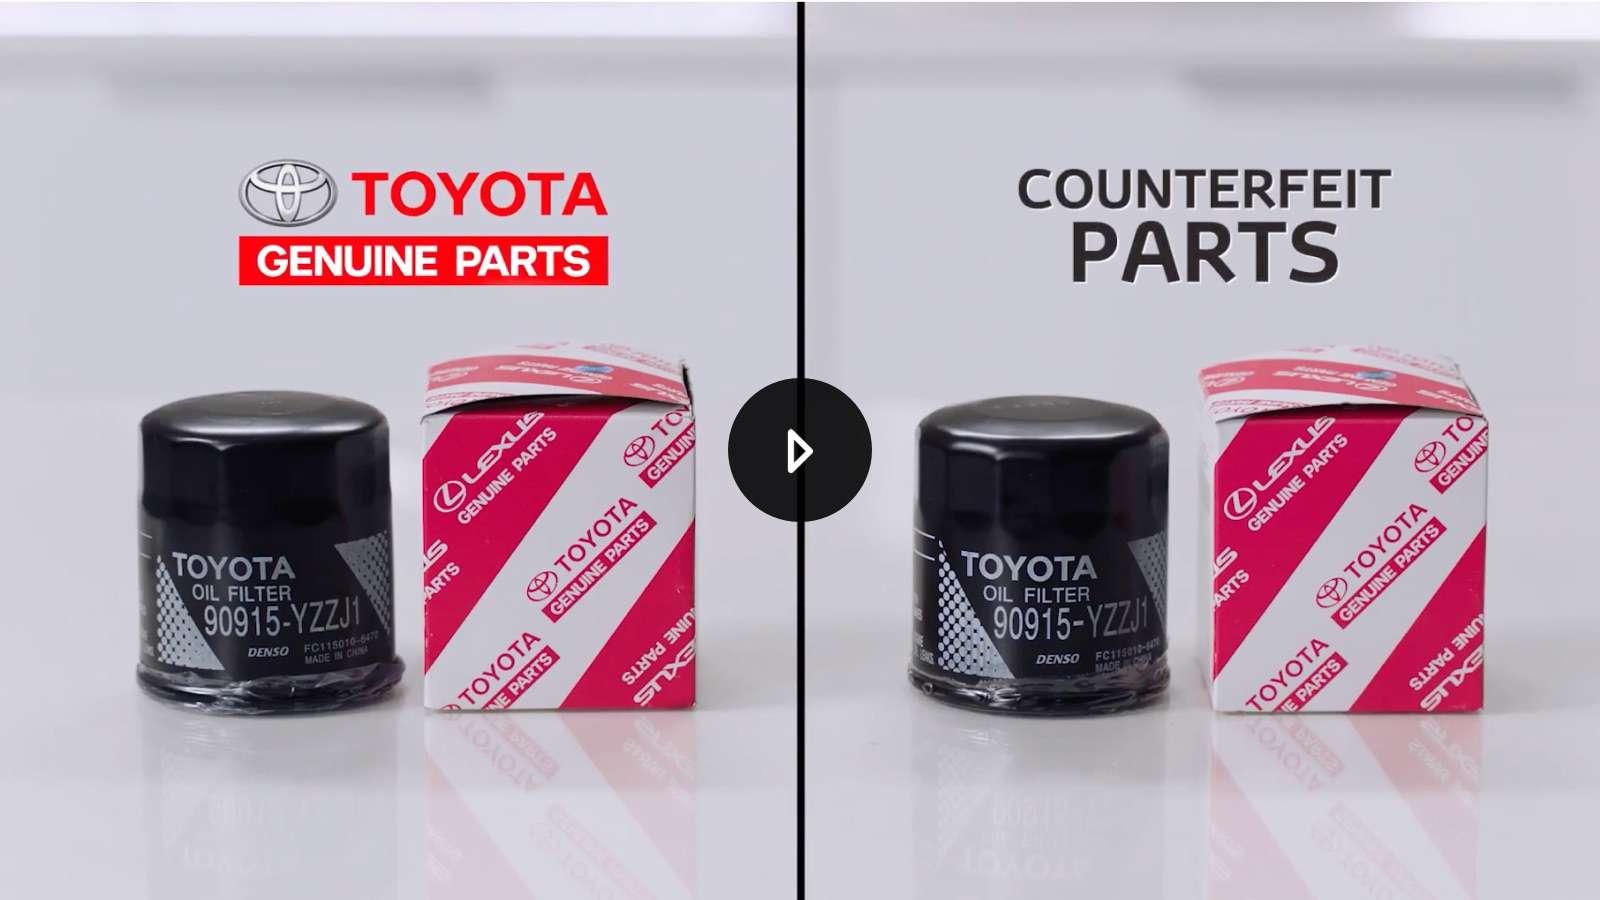 Suku Cadang Sparepart Toyota Asli vs Palsu